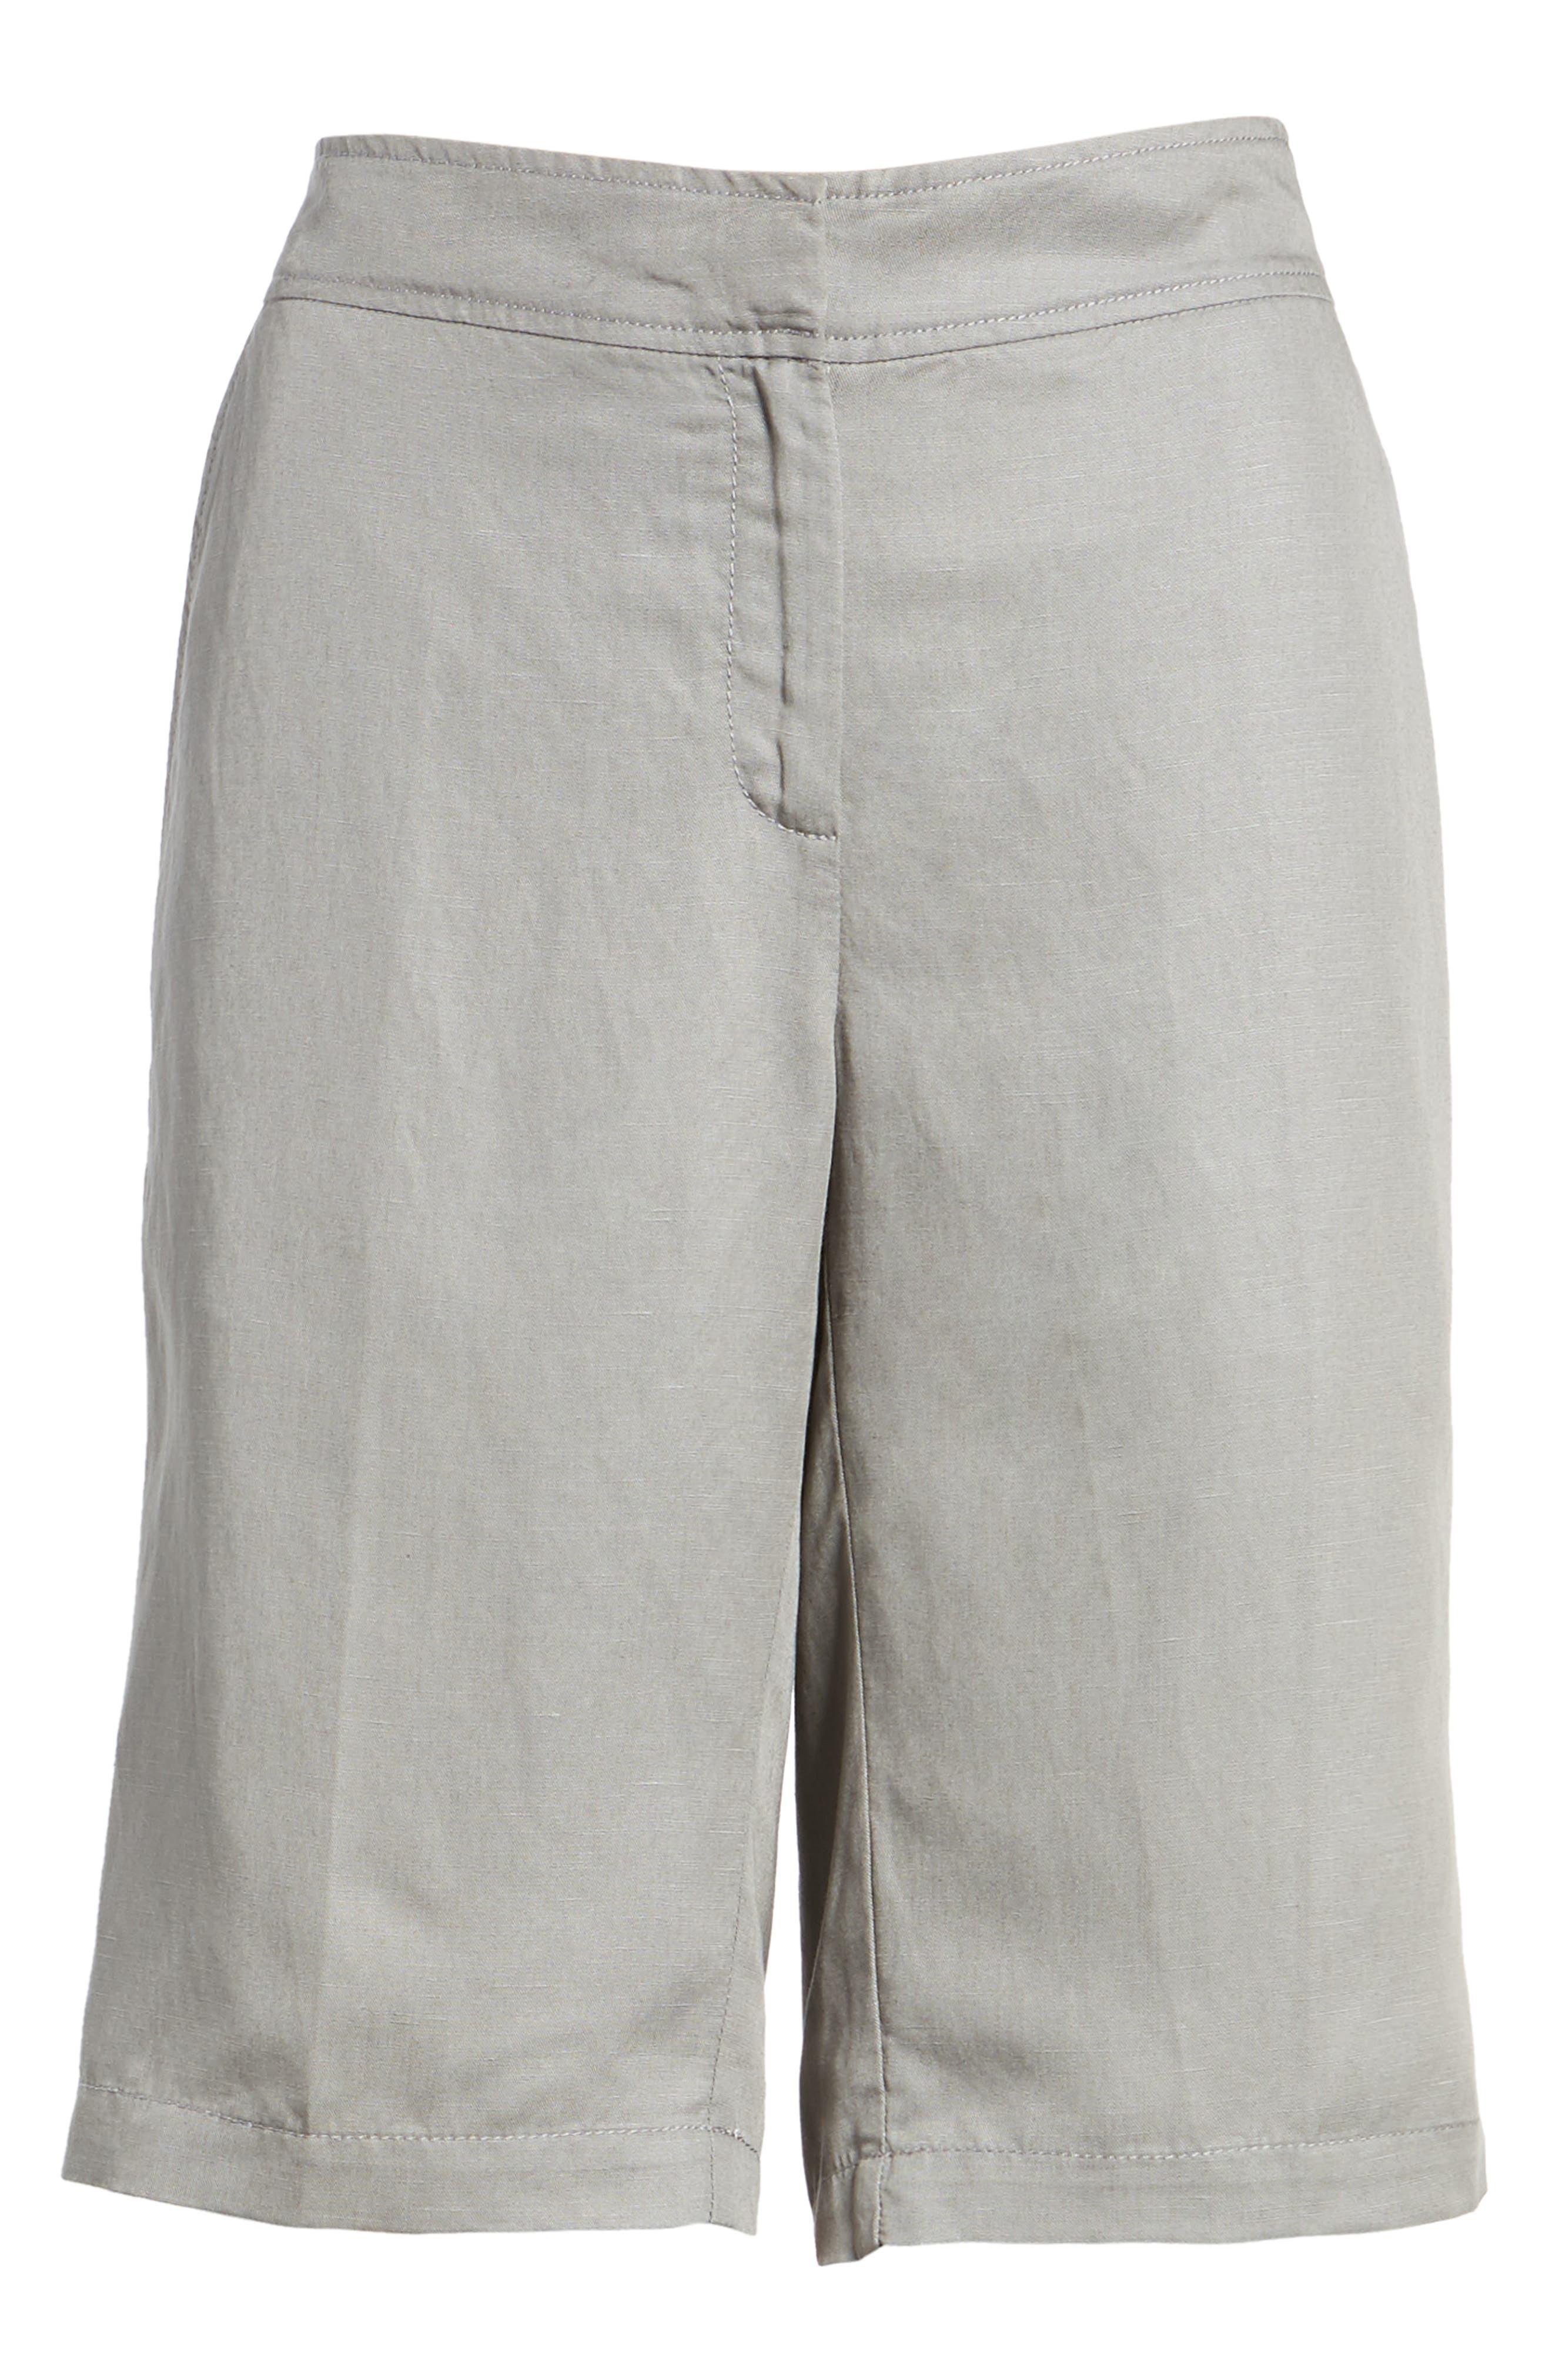 Tencel<sup>®</sup> Lyocell & Linen Walking Shorts,                             Alternate thumbnail 17, color,